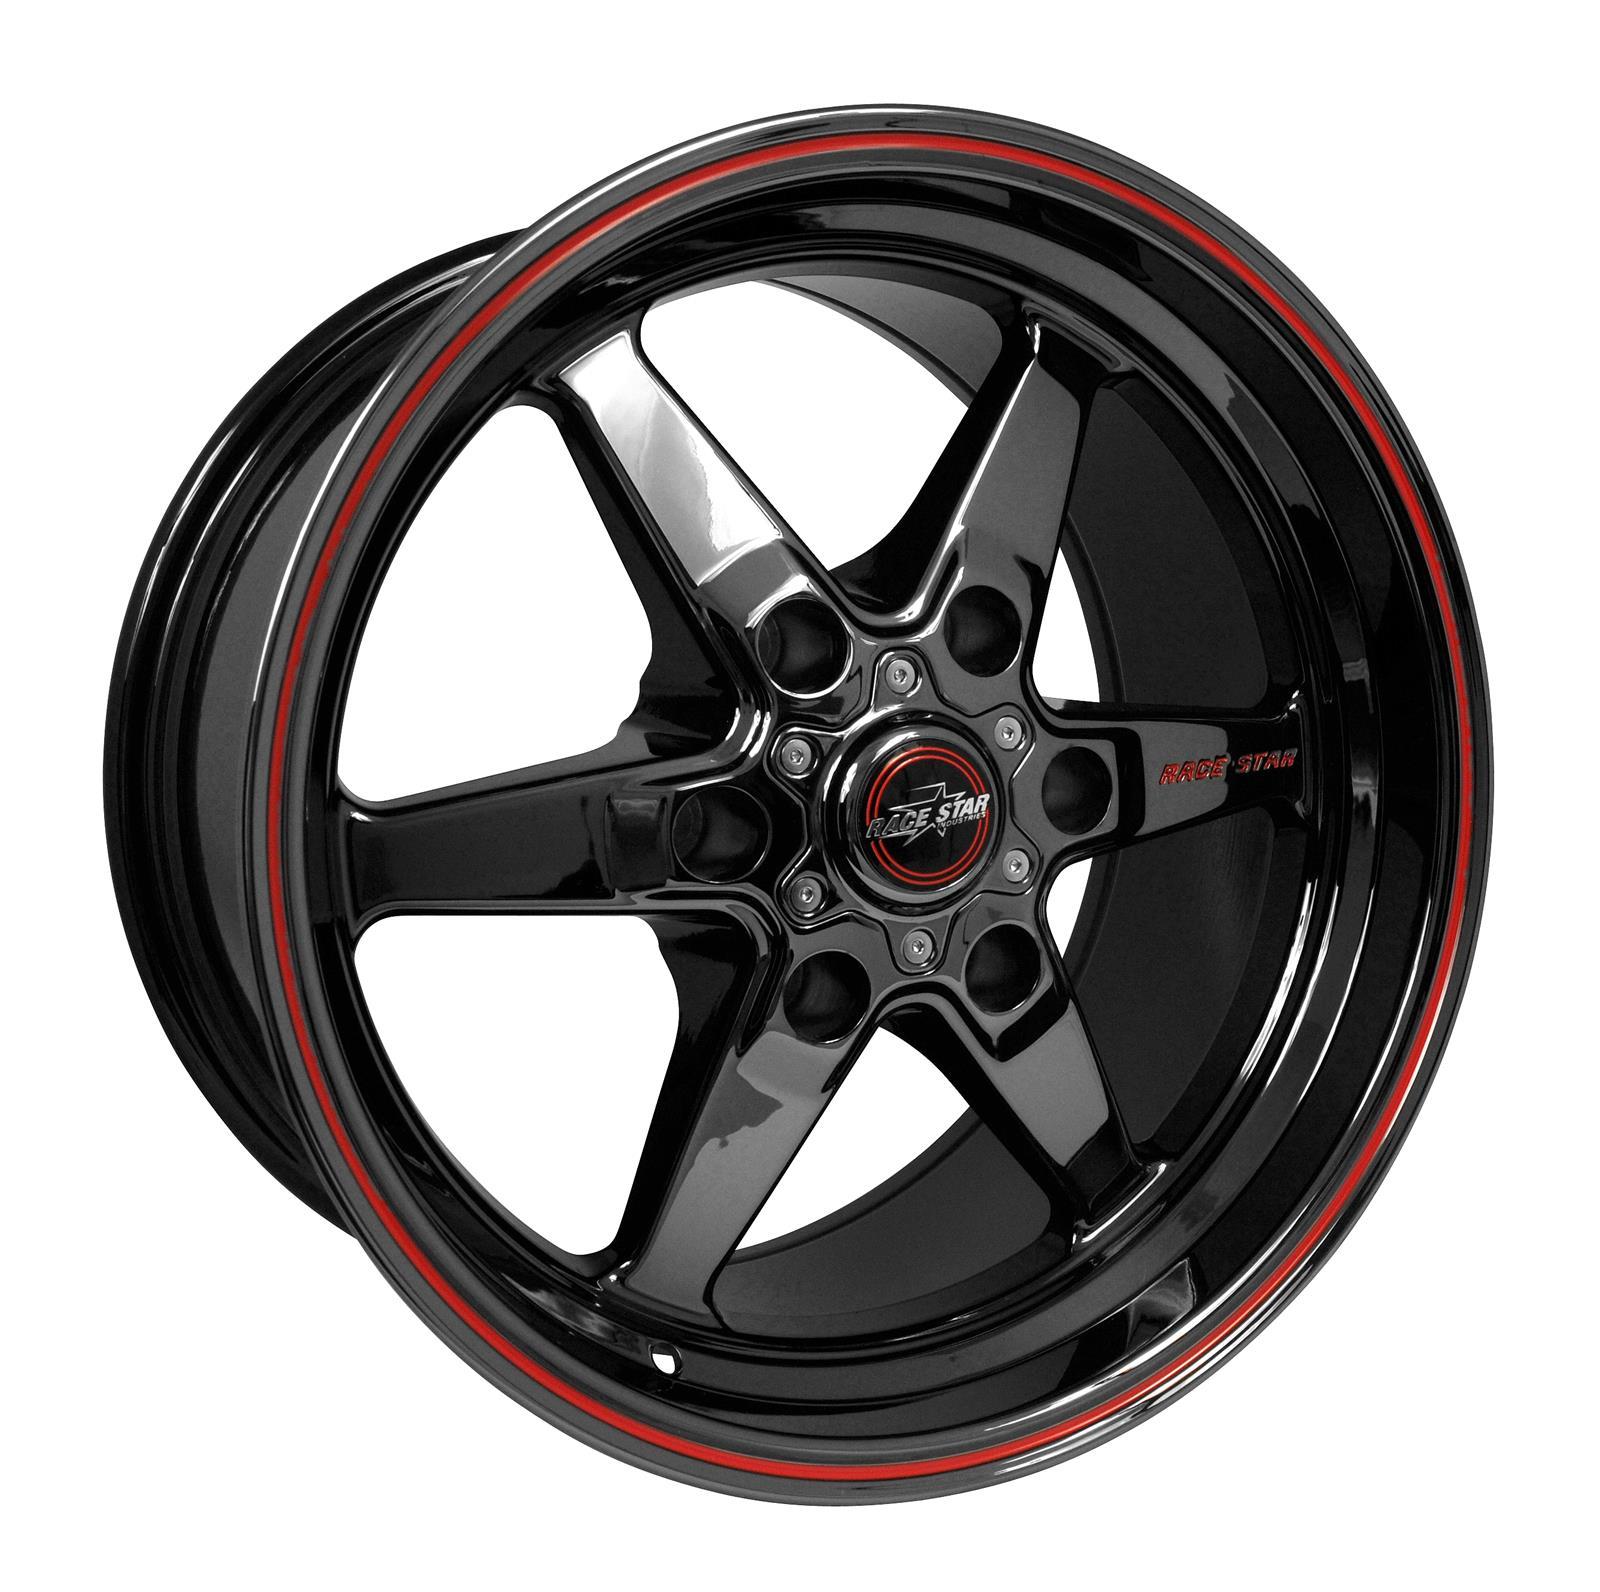 Race Star 93 Truck Star Black Chrome Wheels 93 795752bc